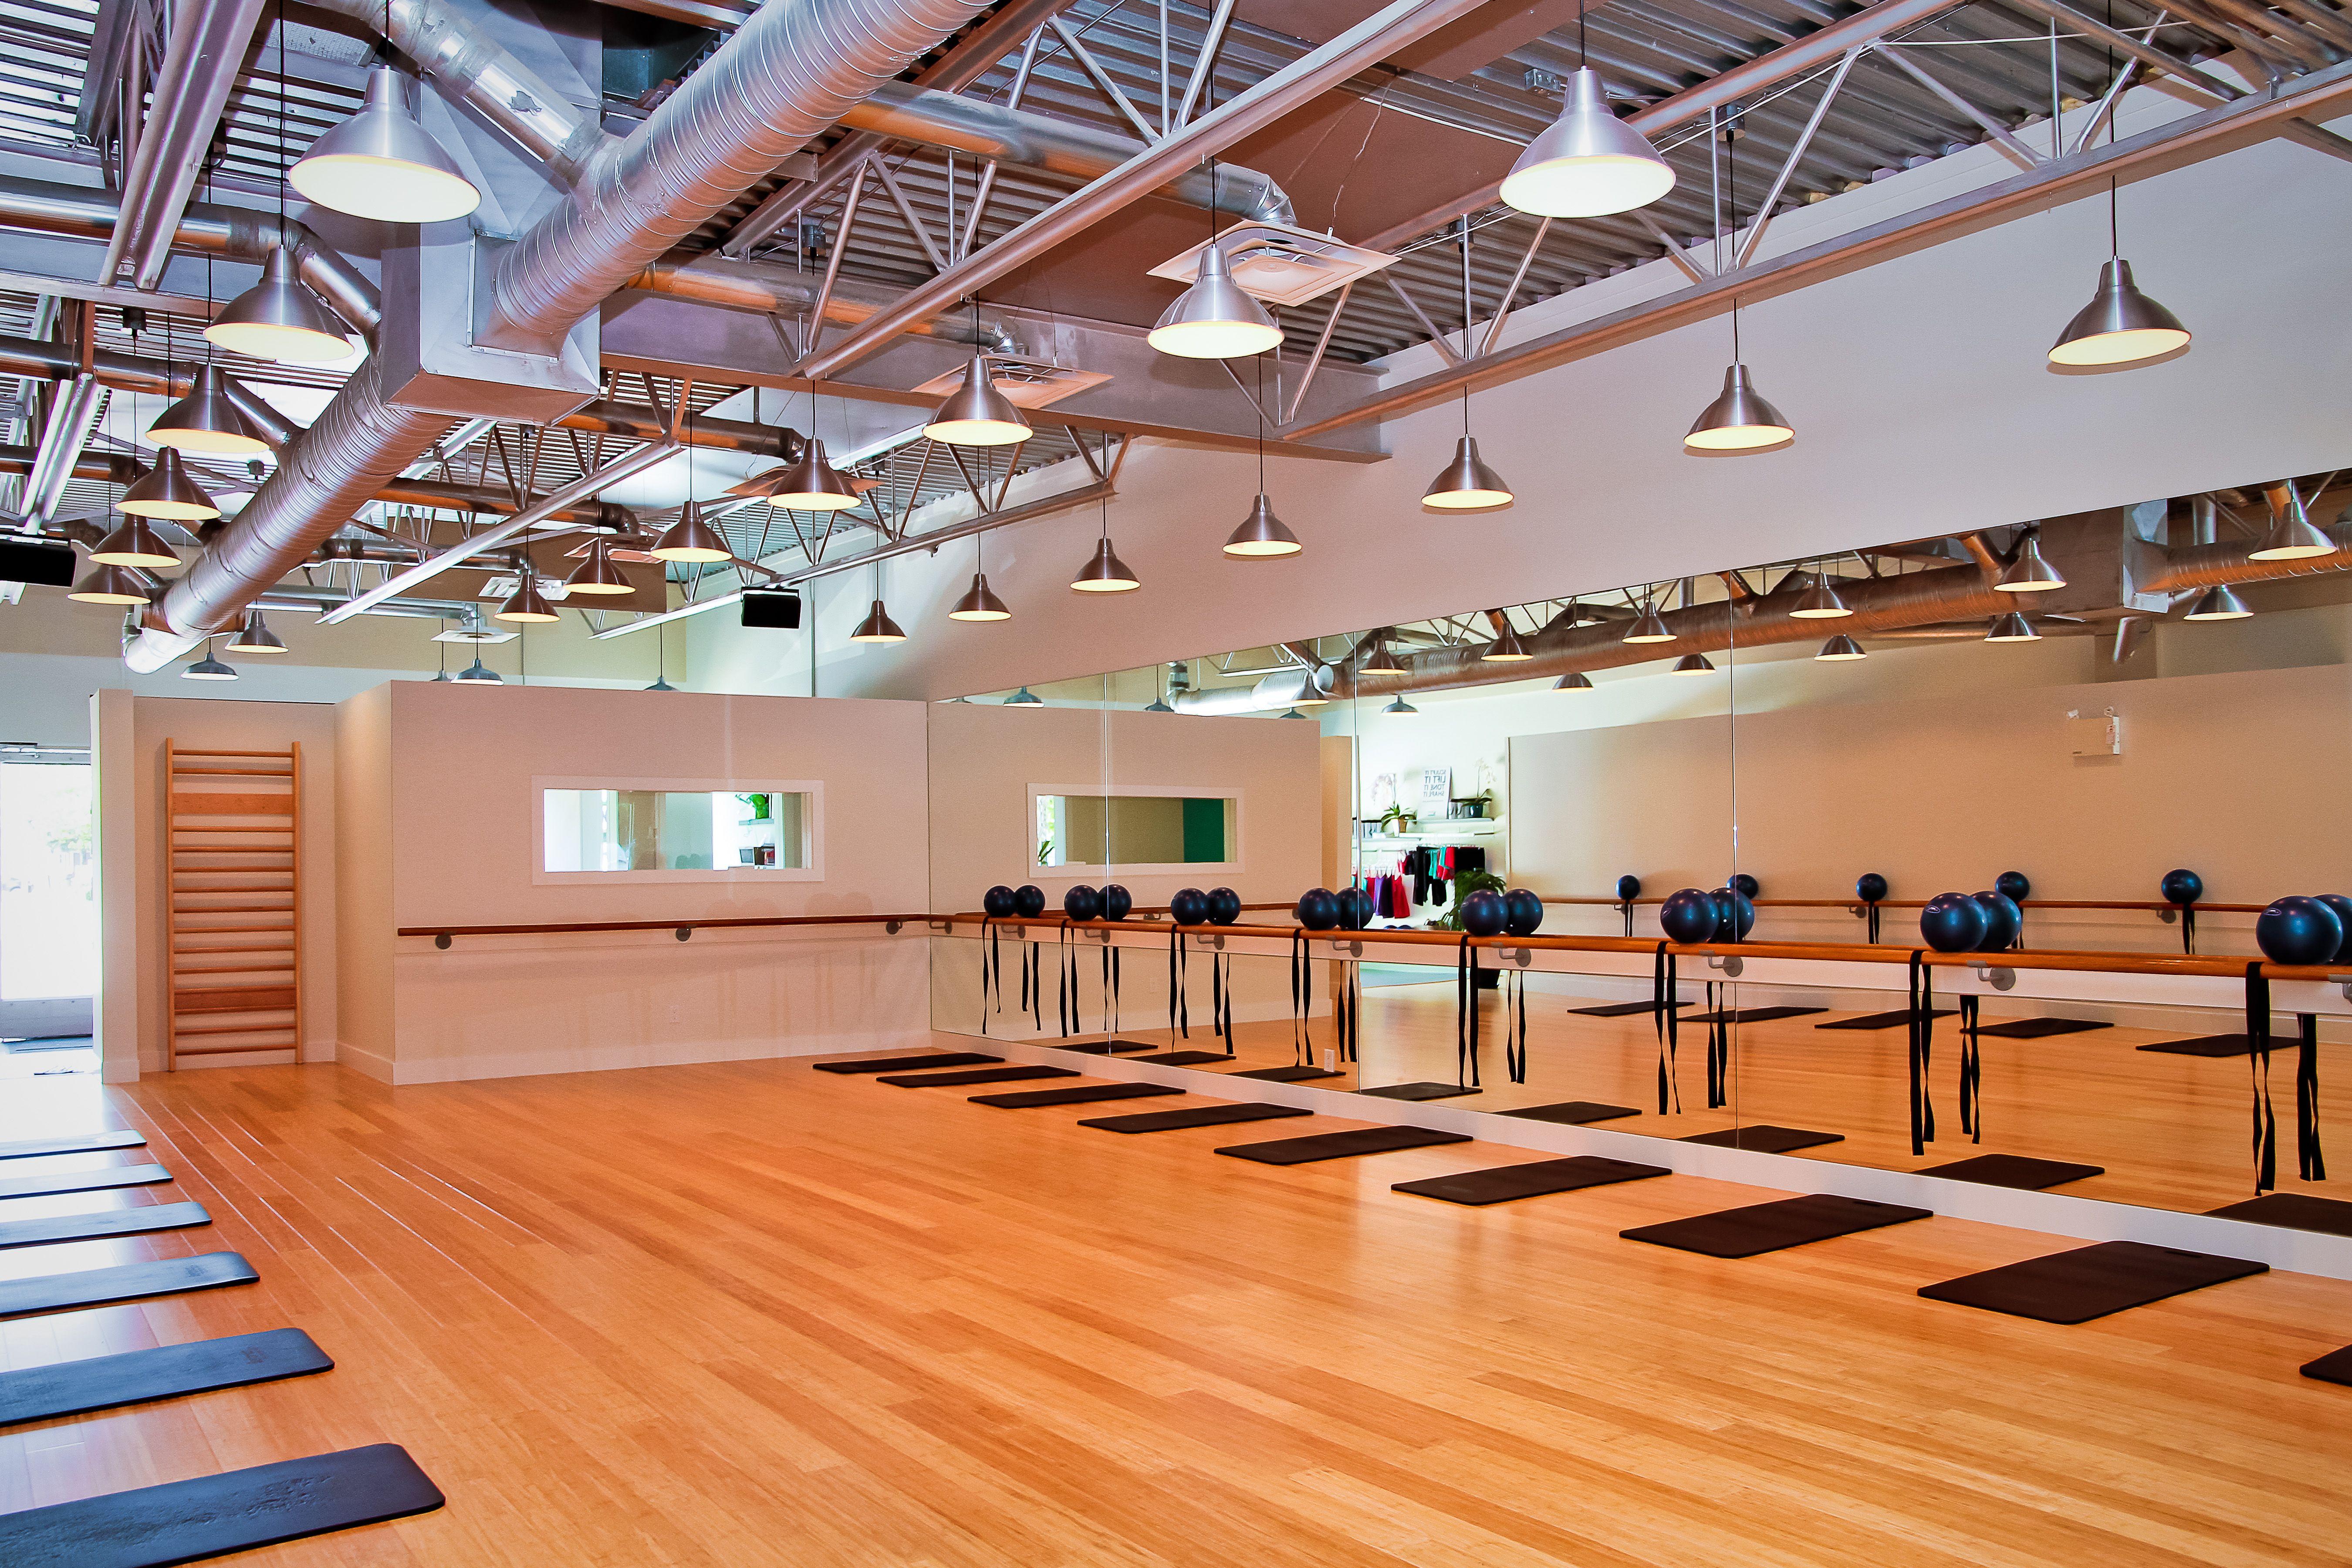 Barre fitness north shore studio bamboo floors ballet